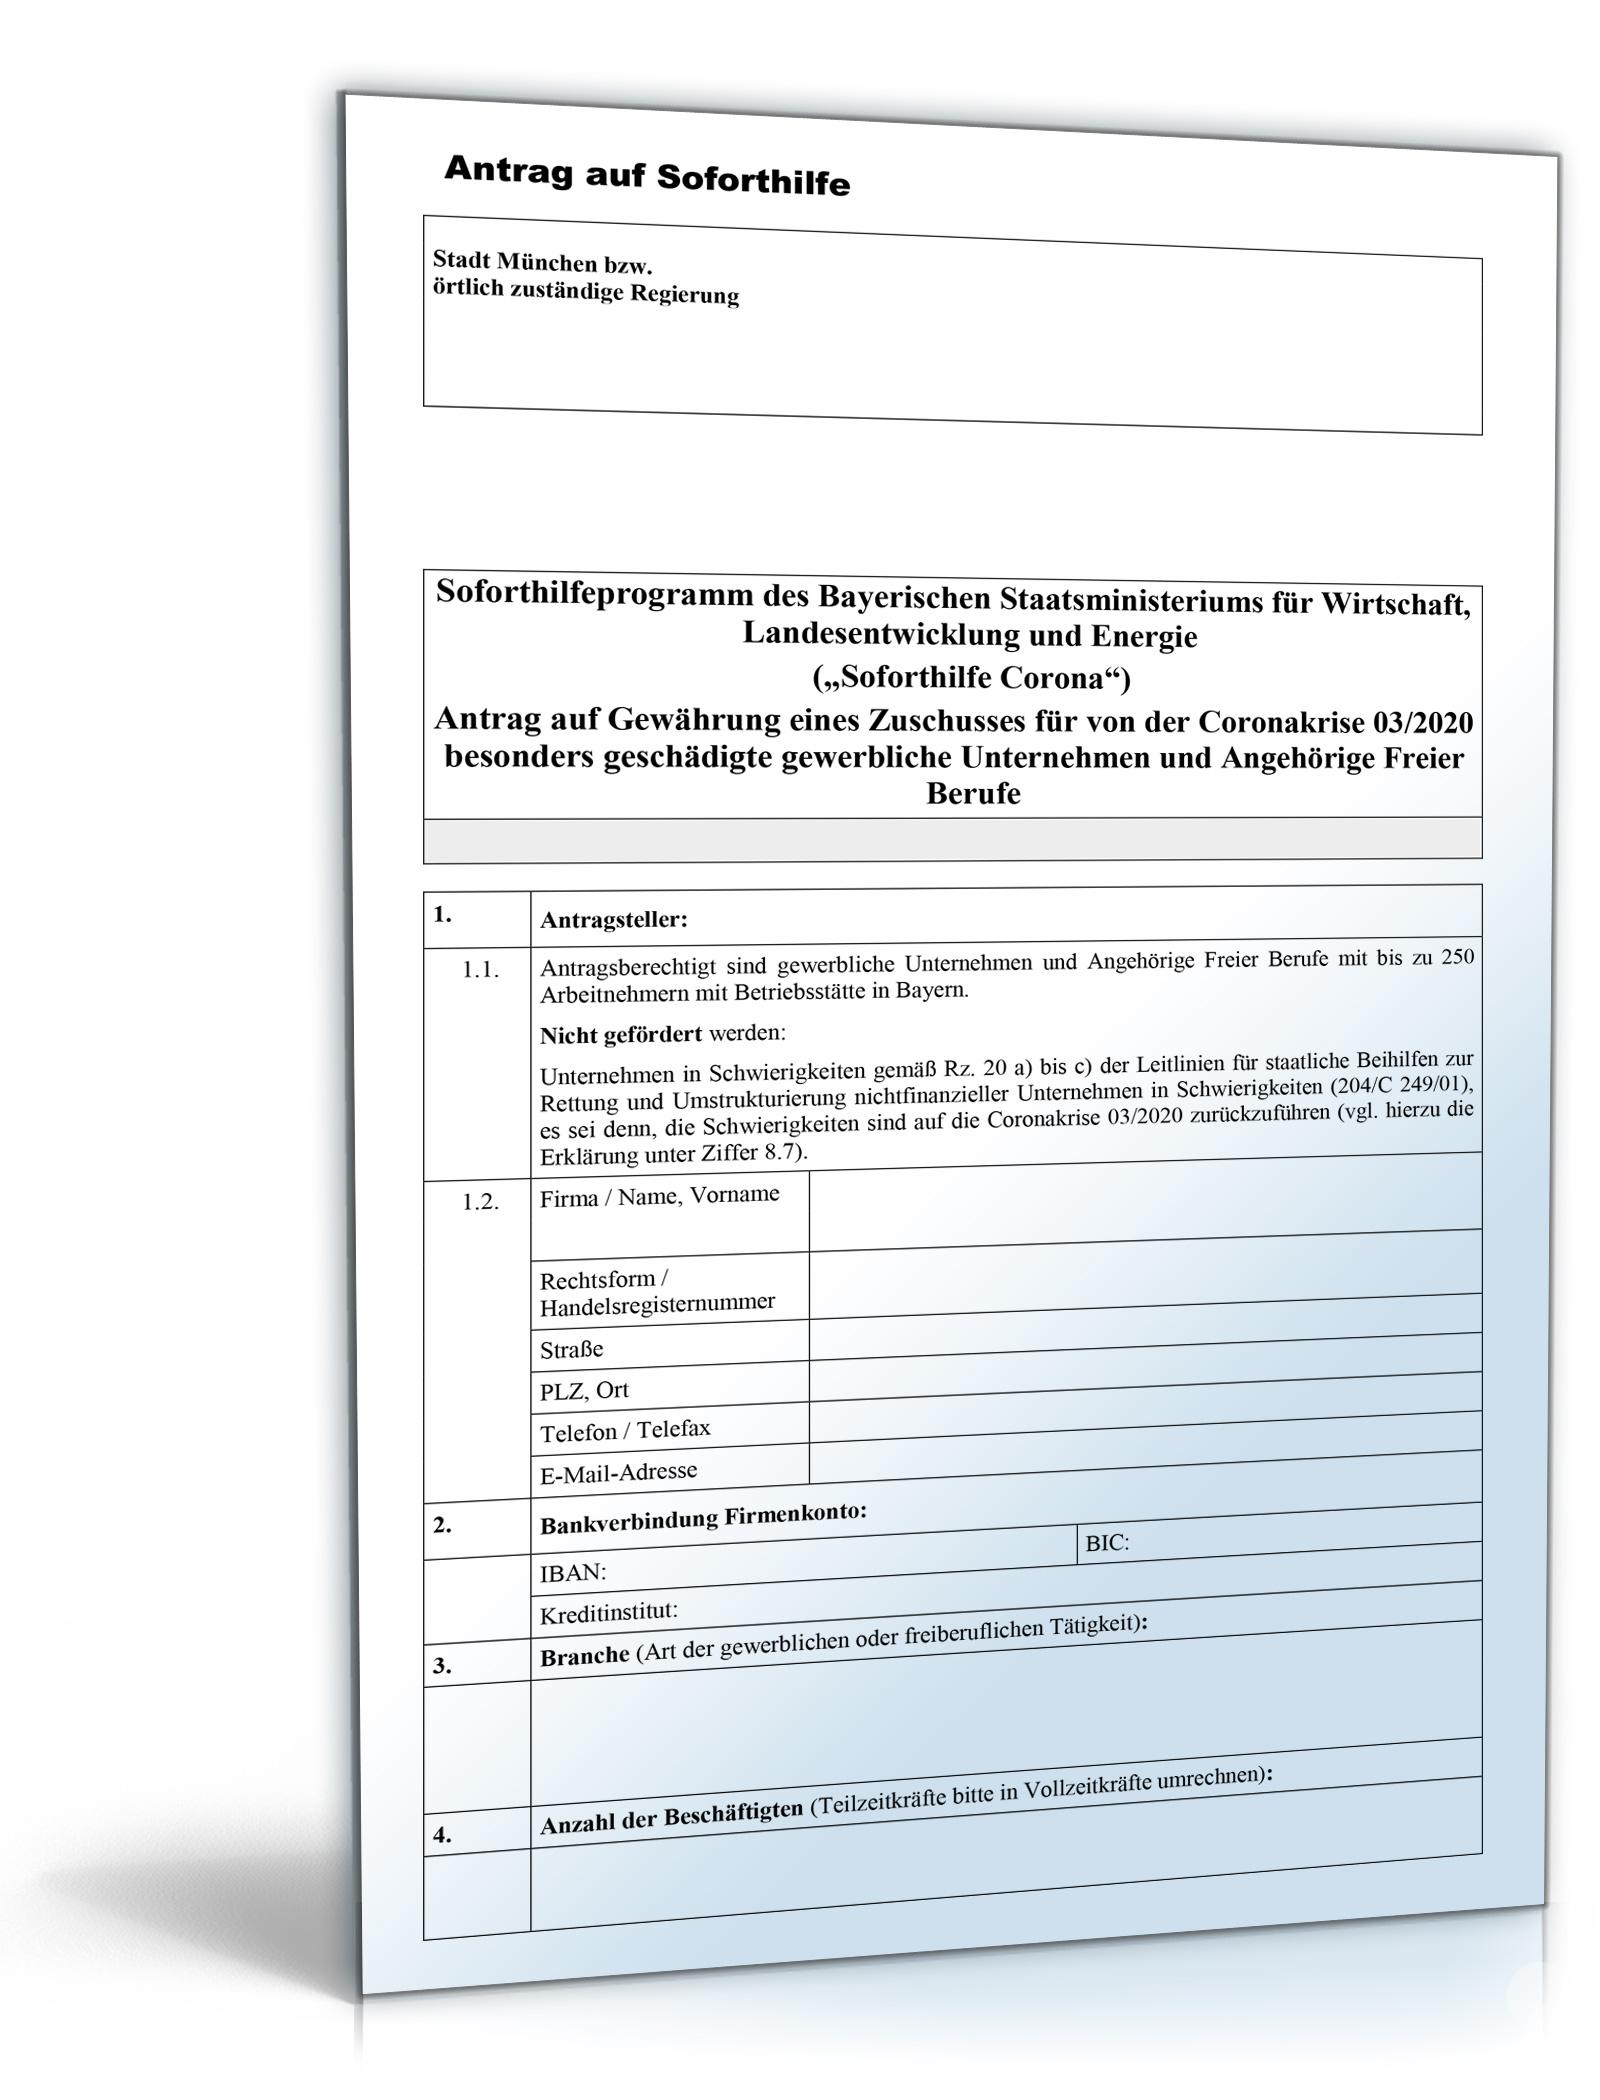 Antrag Soforthilfe Corona Dokument zum Download